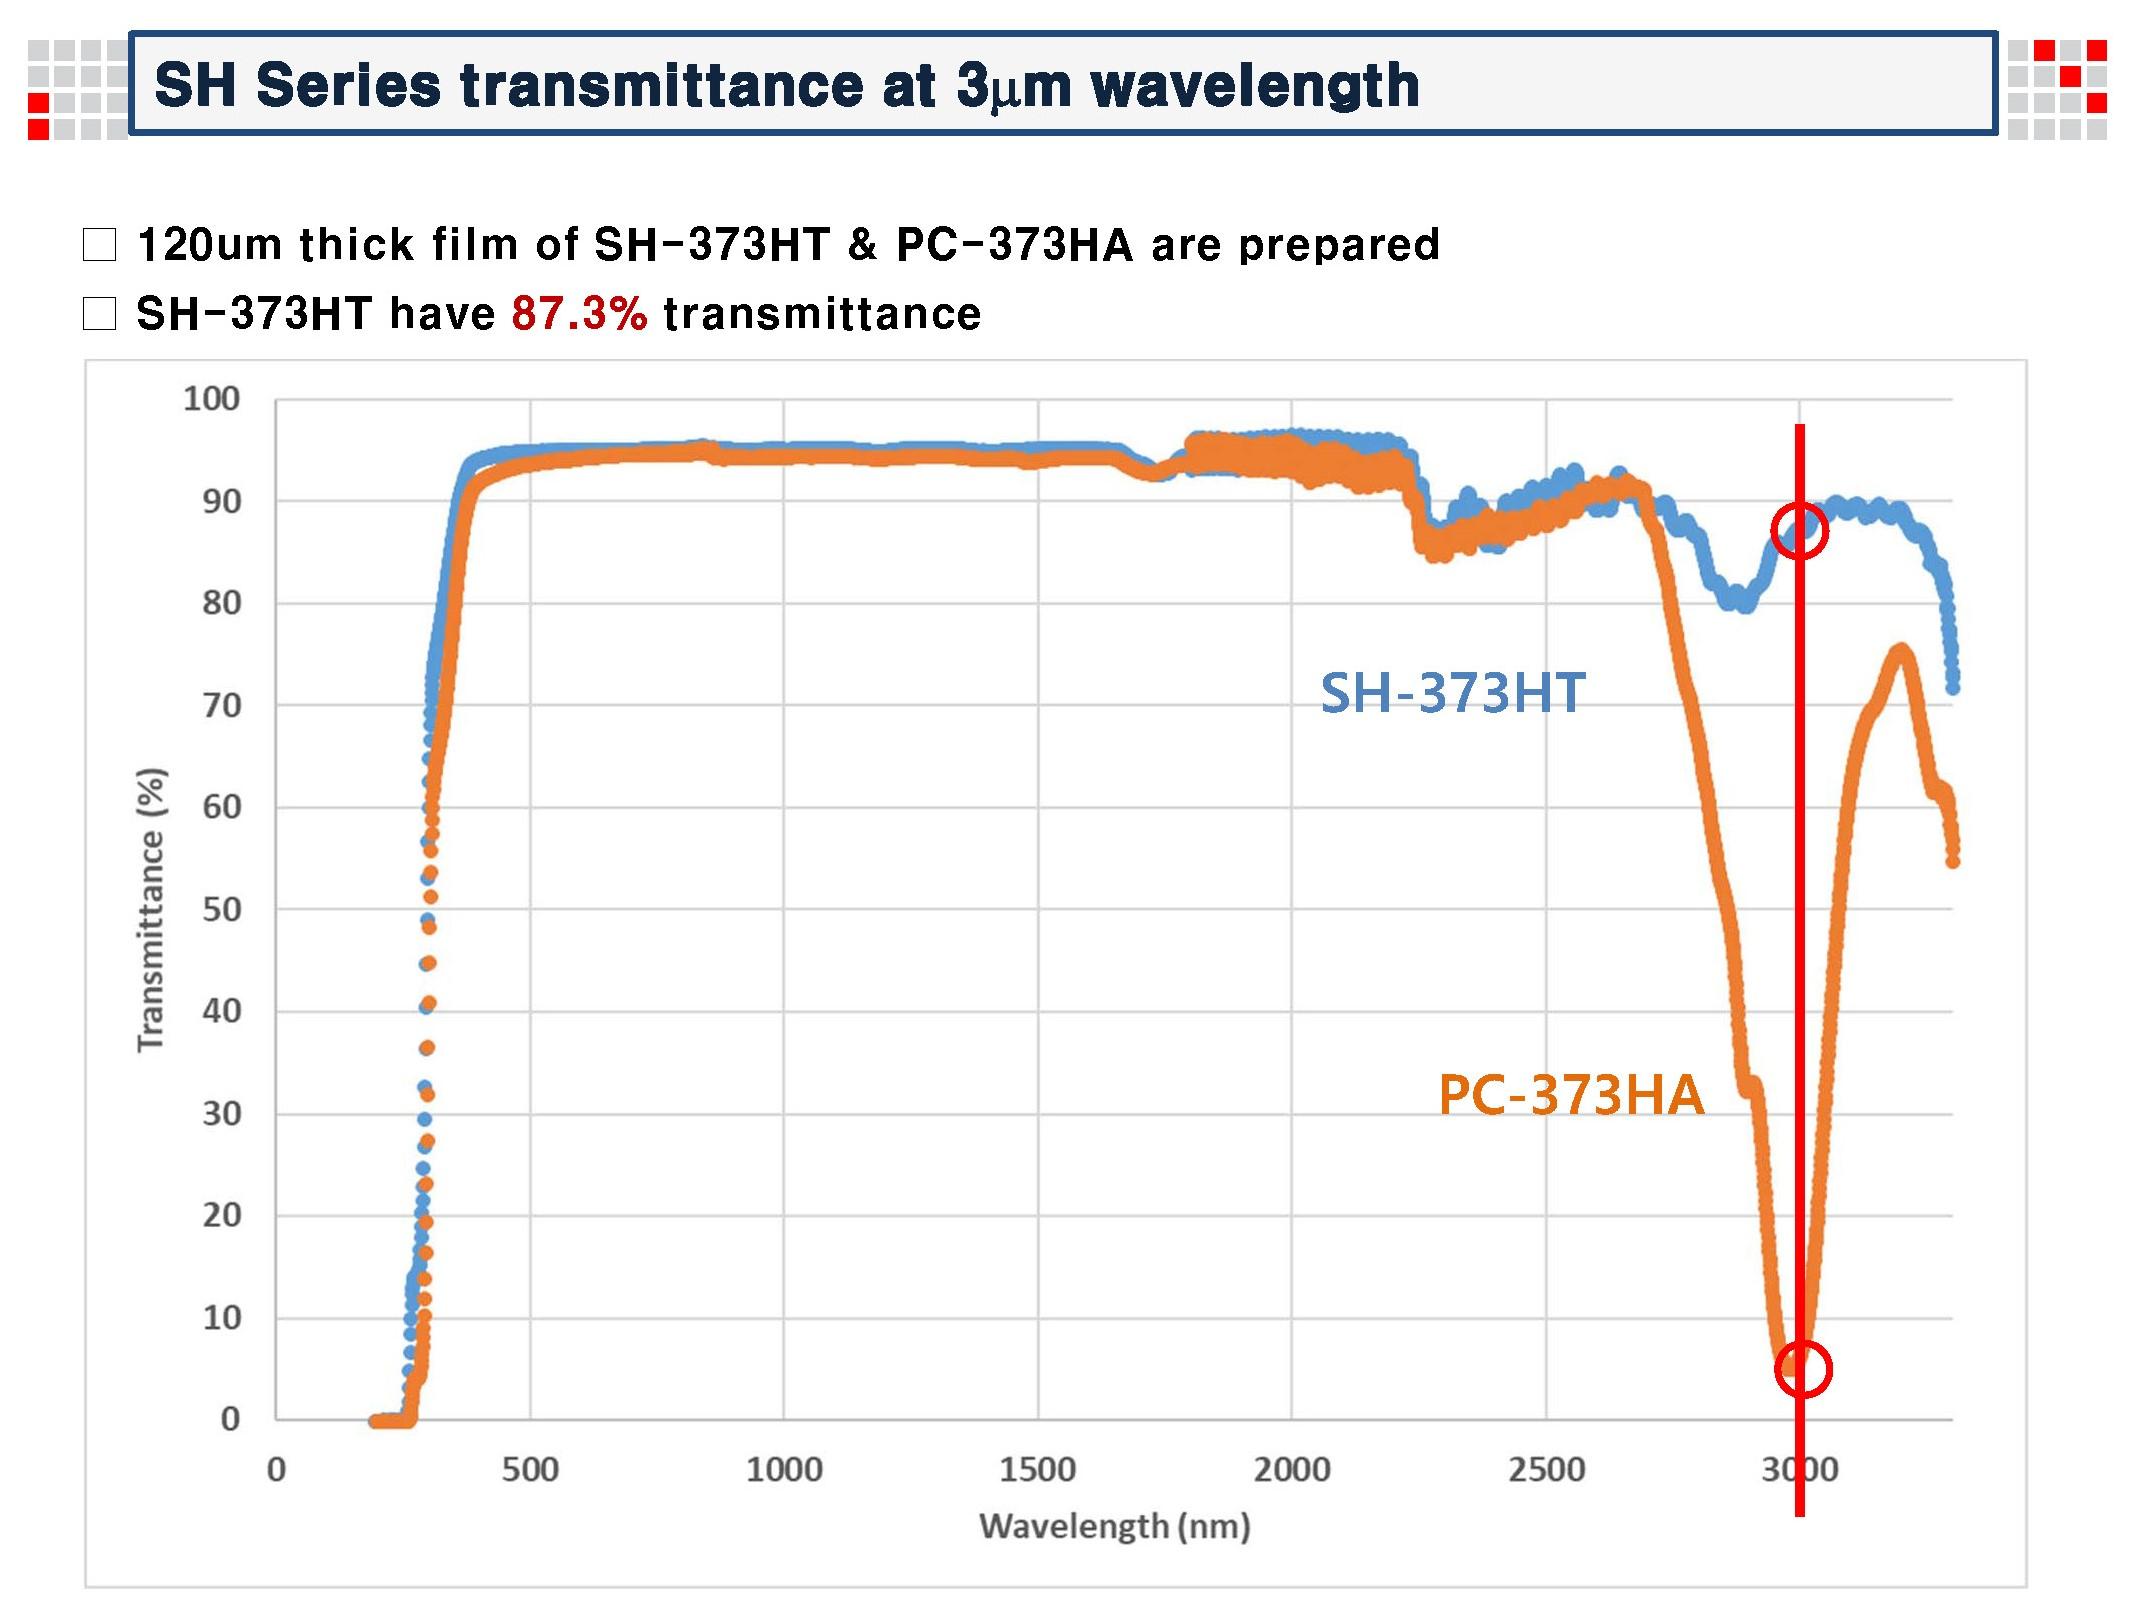 ADM_180620_Transmittance of SH Sereis at 3um.jpg